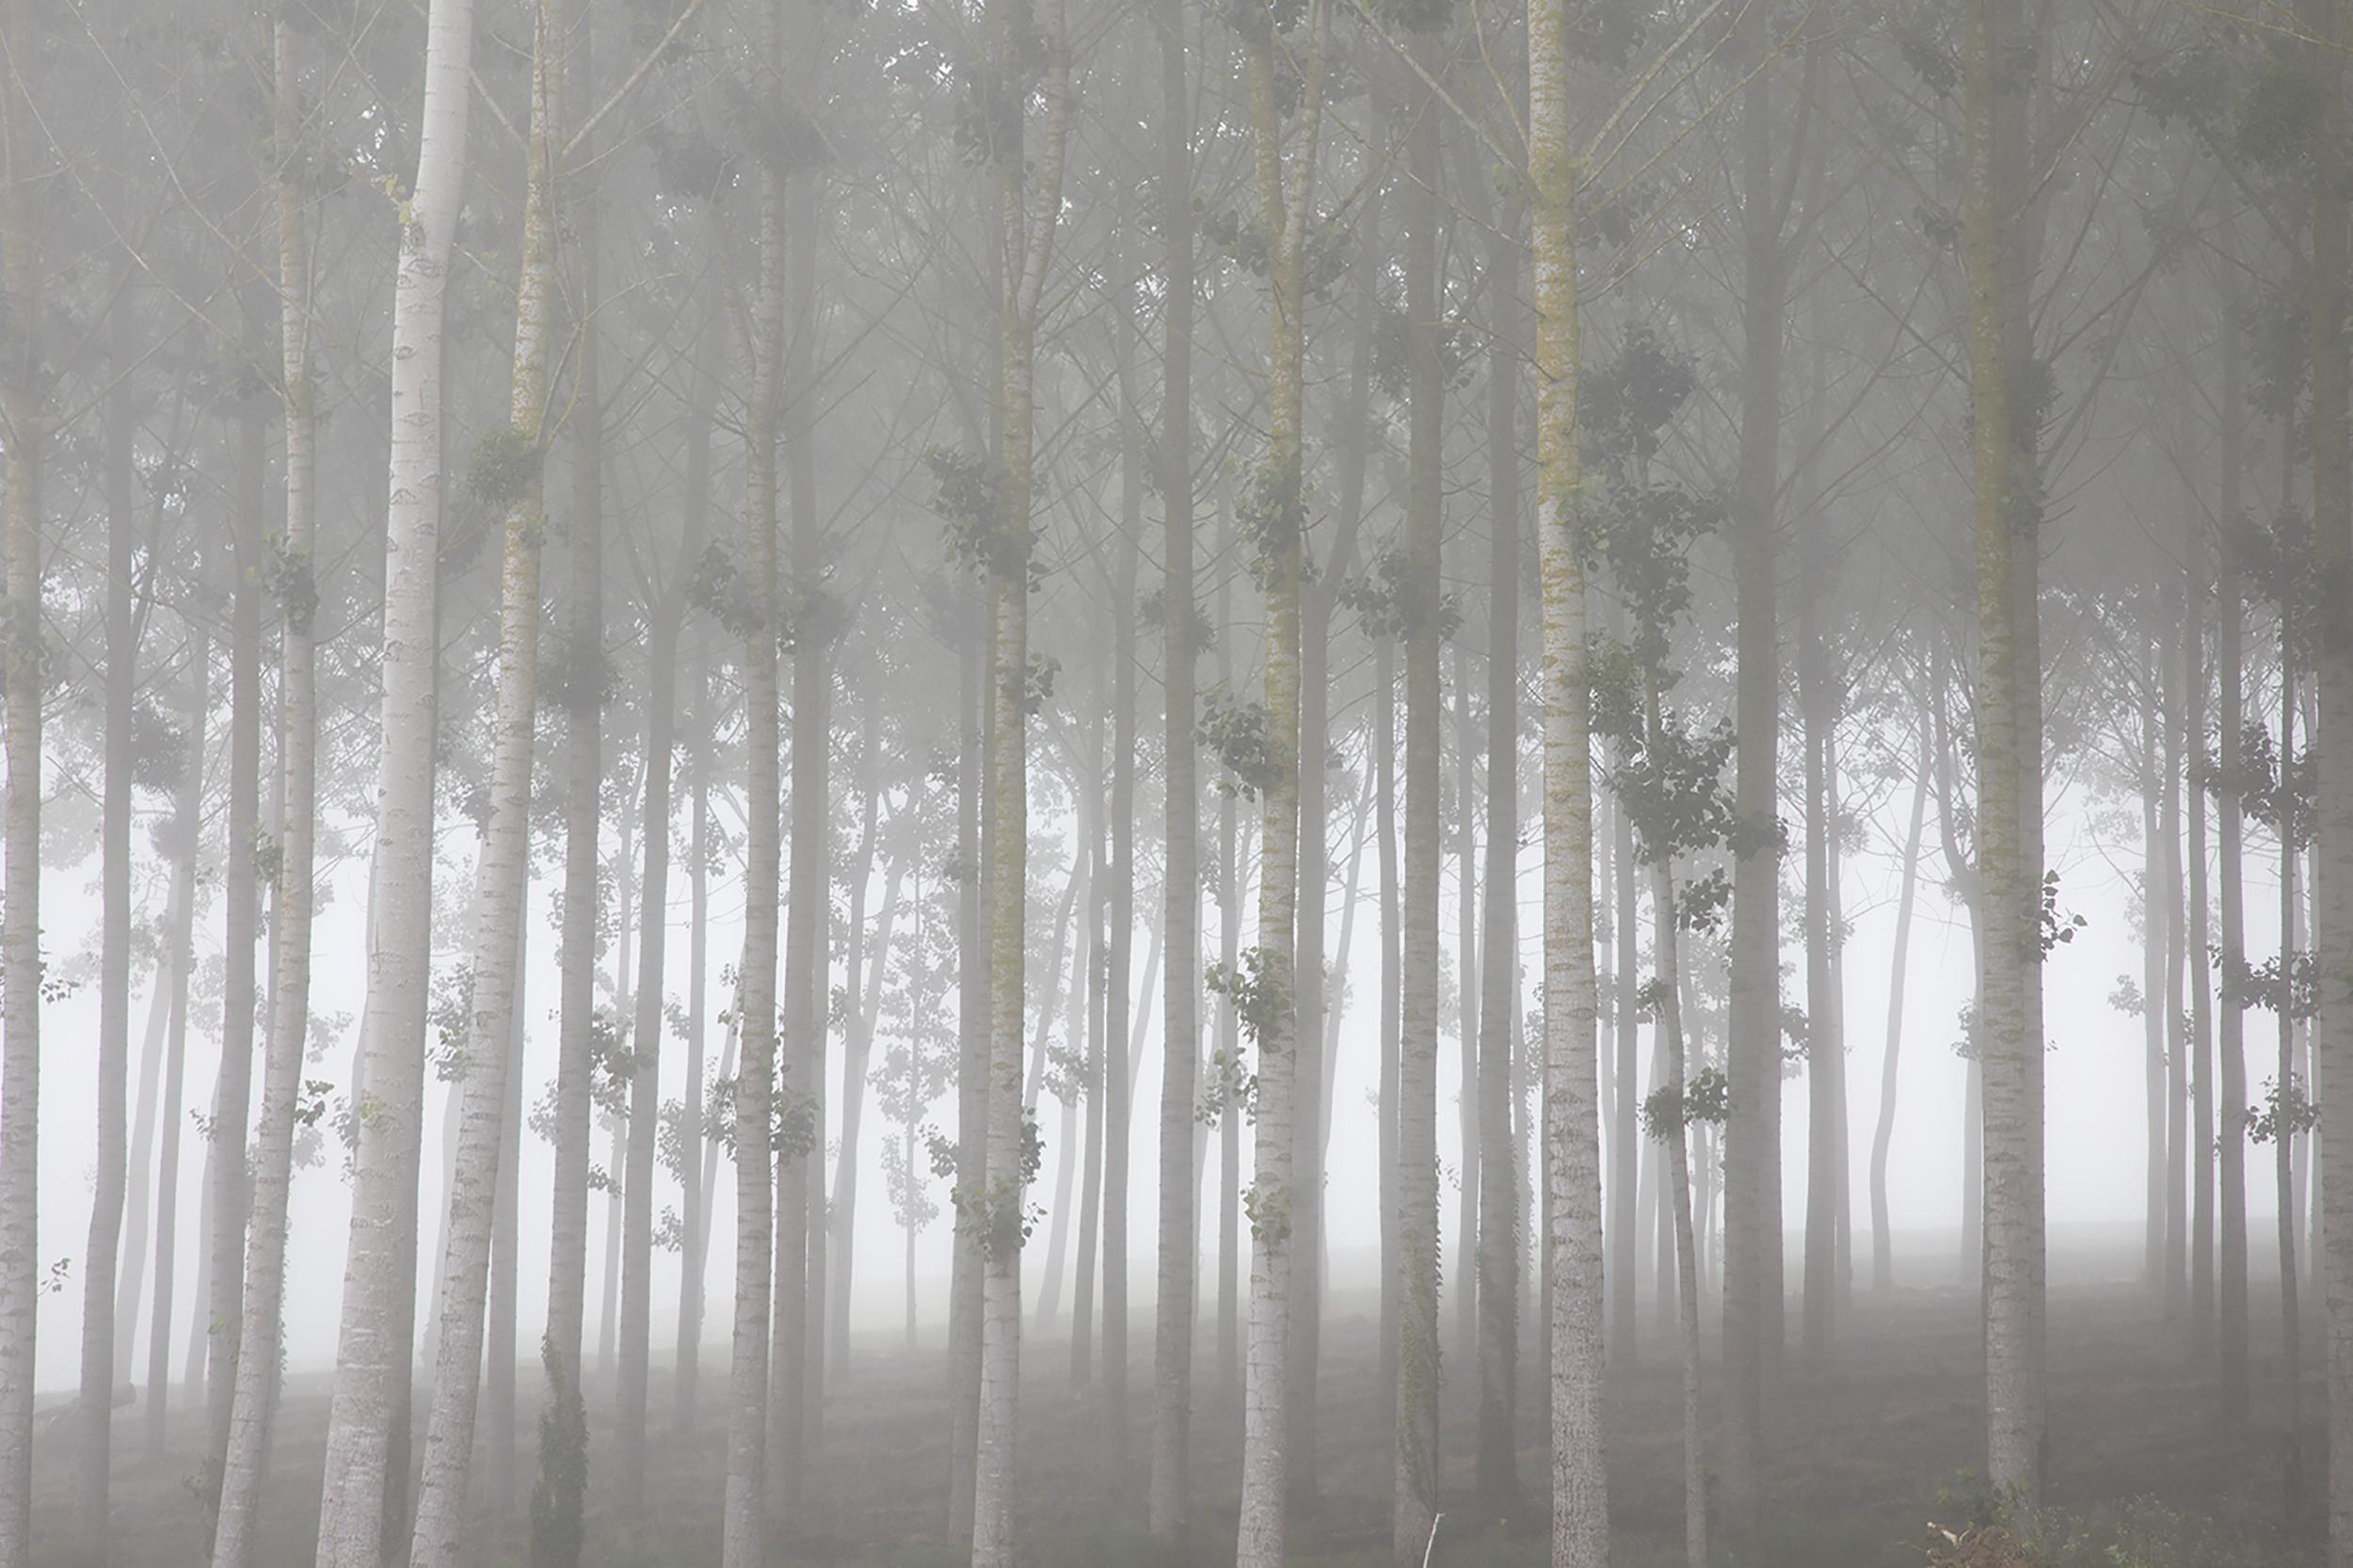 Trees in the Mist 2.jpg